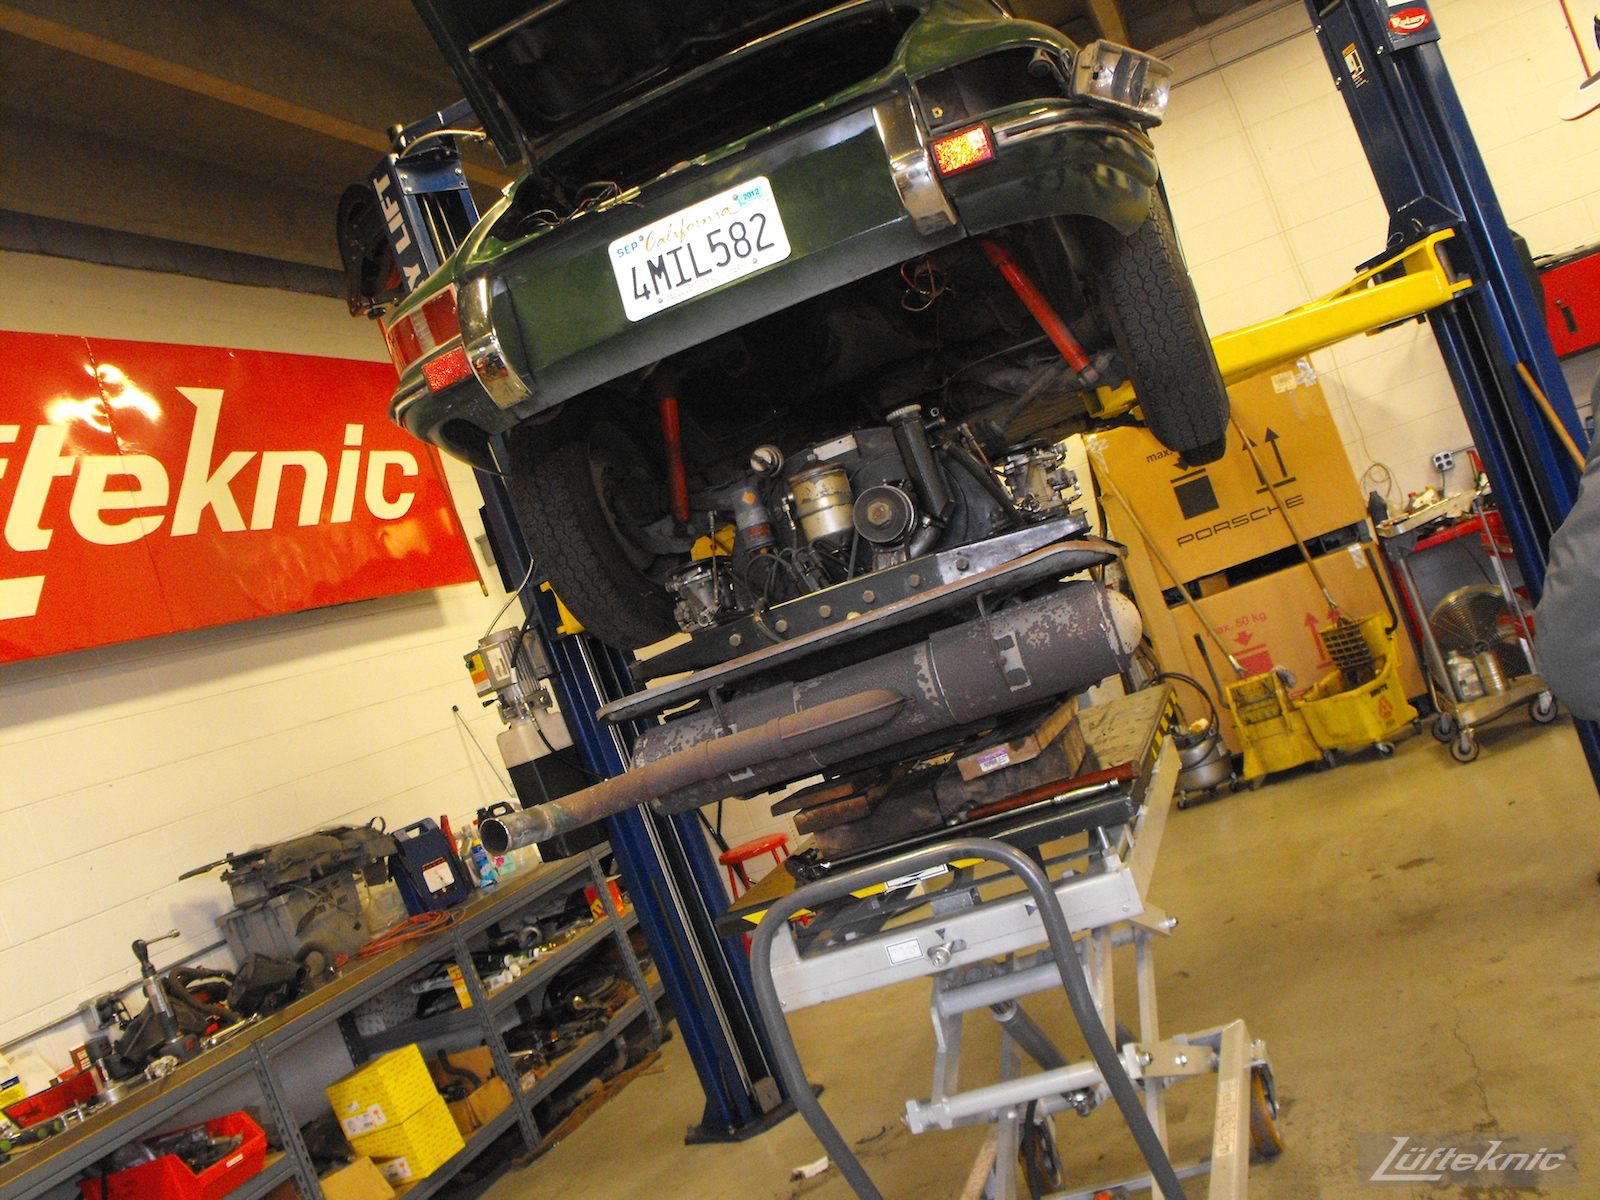 The engine being removed from an Irish Green Porsche 912 undergoing restoration at Lufteknic.